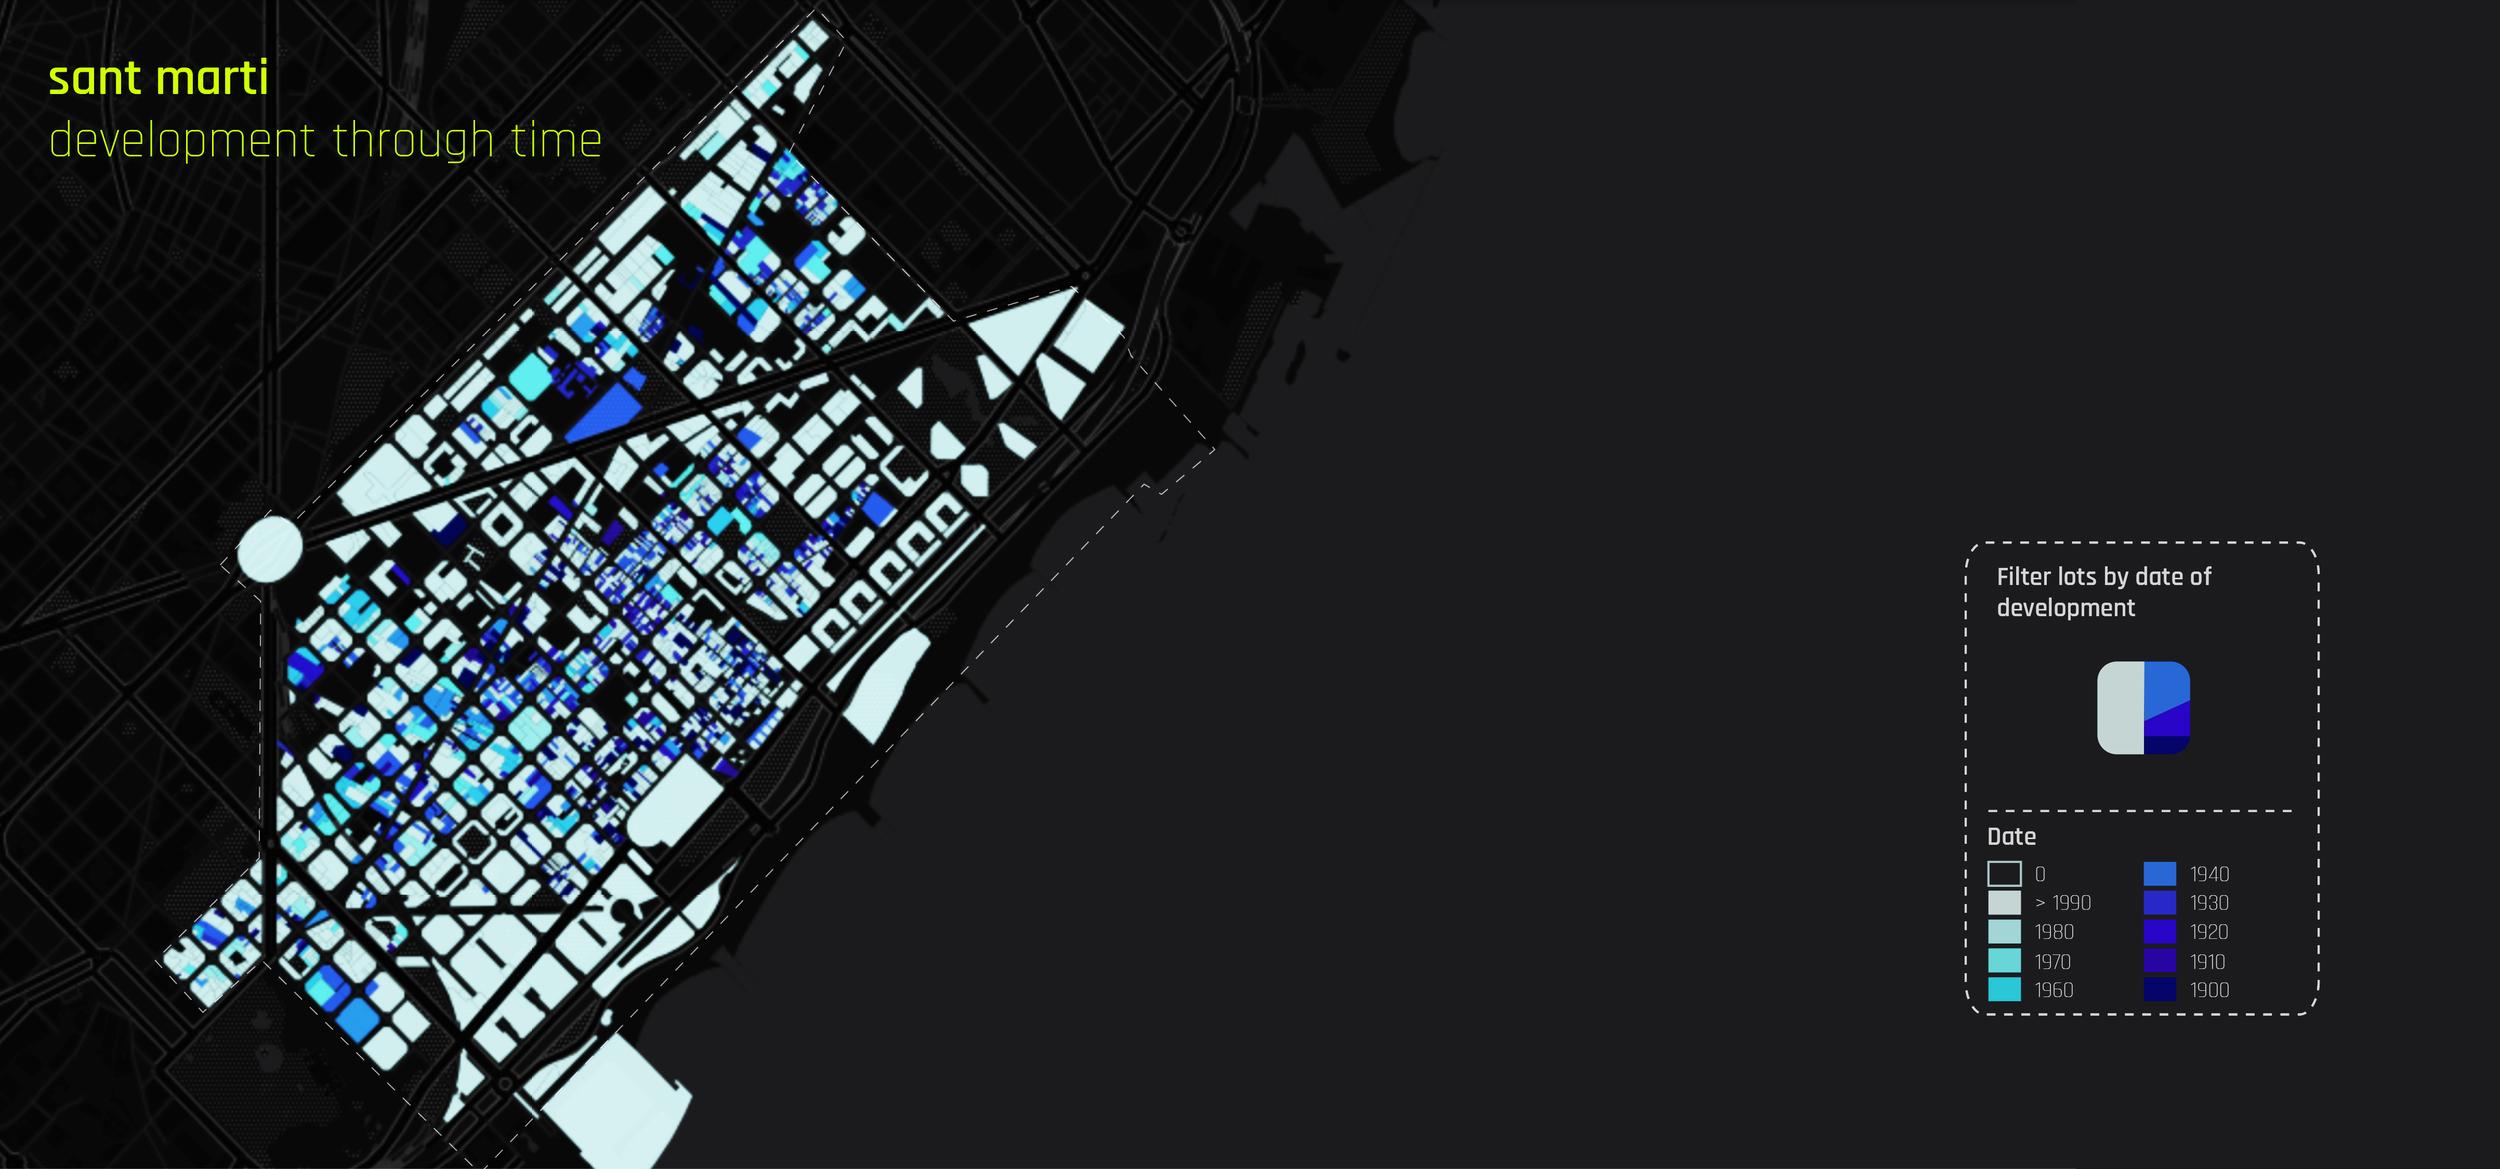 understanding the urban development through time